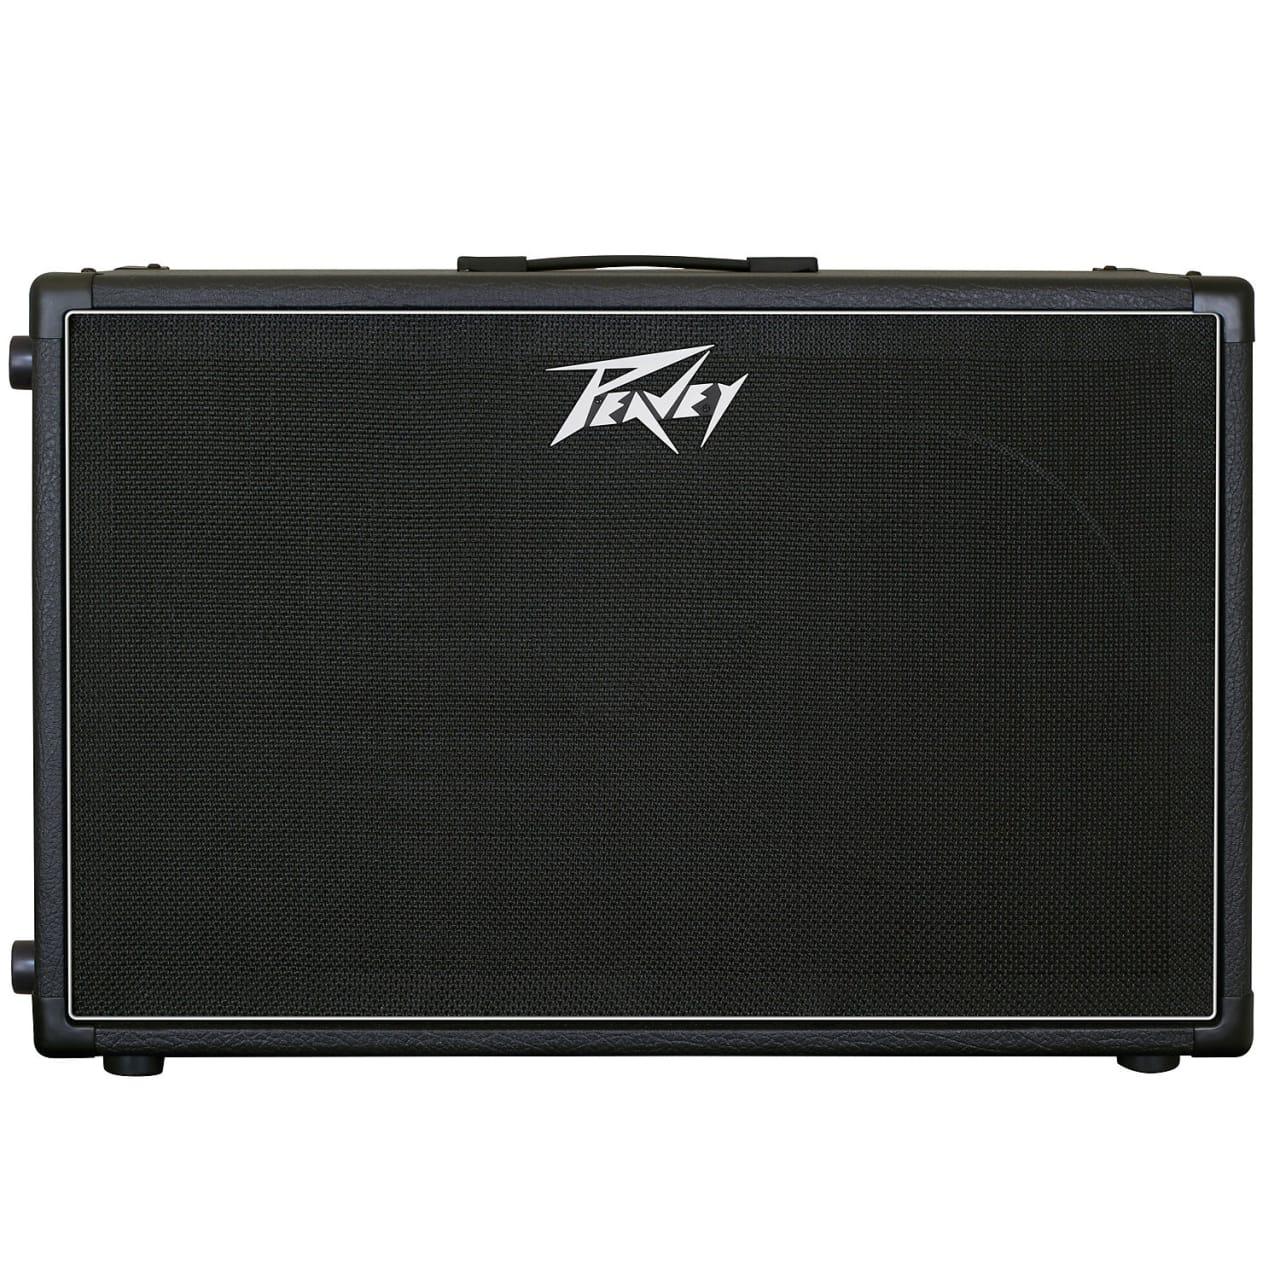 peavey 212 6 guitar speaker cabinet 120 watts 2x12 reverb. Black Bedroom Furniture Sets. Home Design Ideas